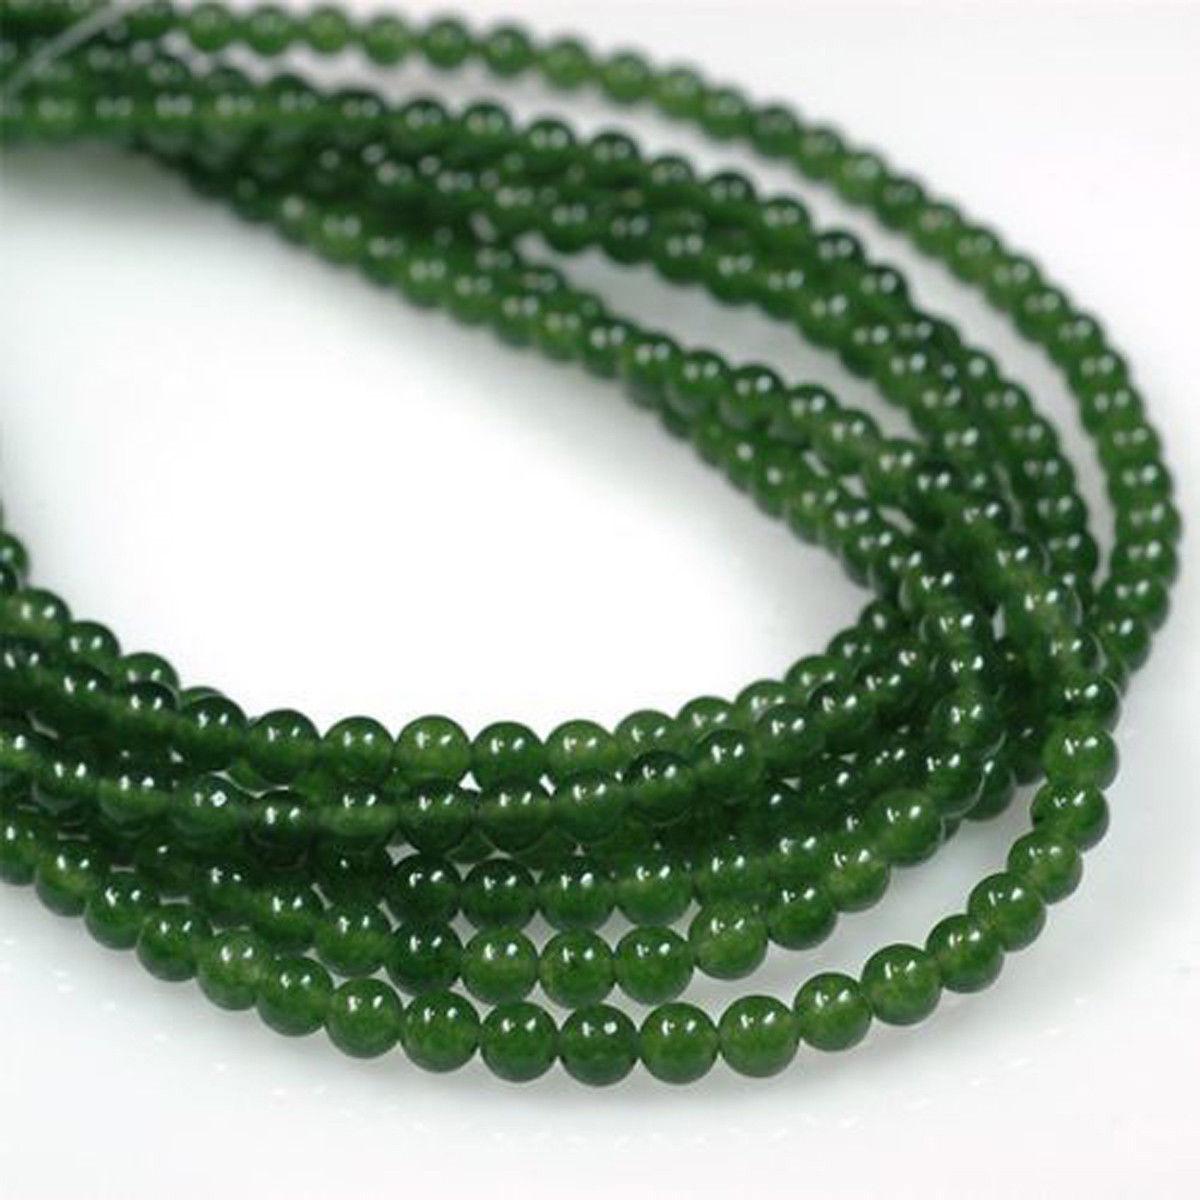 Genuine Jade Beads: Natural Genuine 6mm Green Nephrite Jade Beads Loose Beads